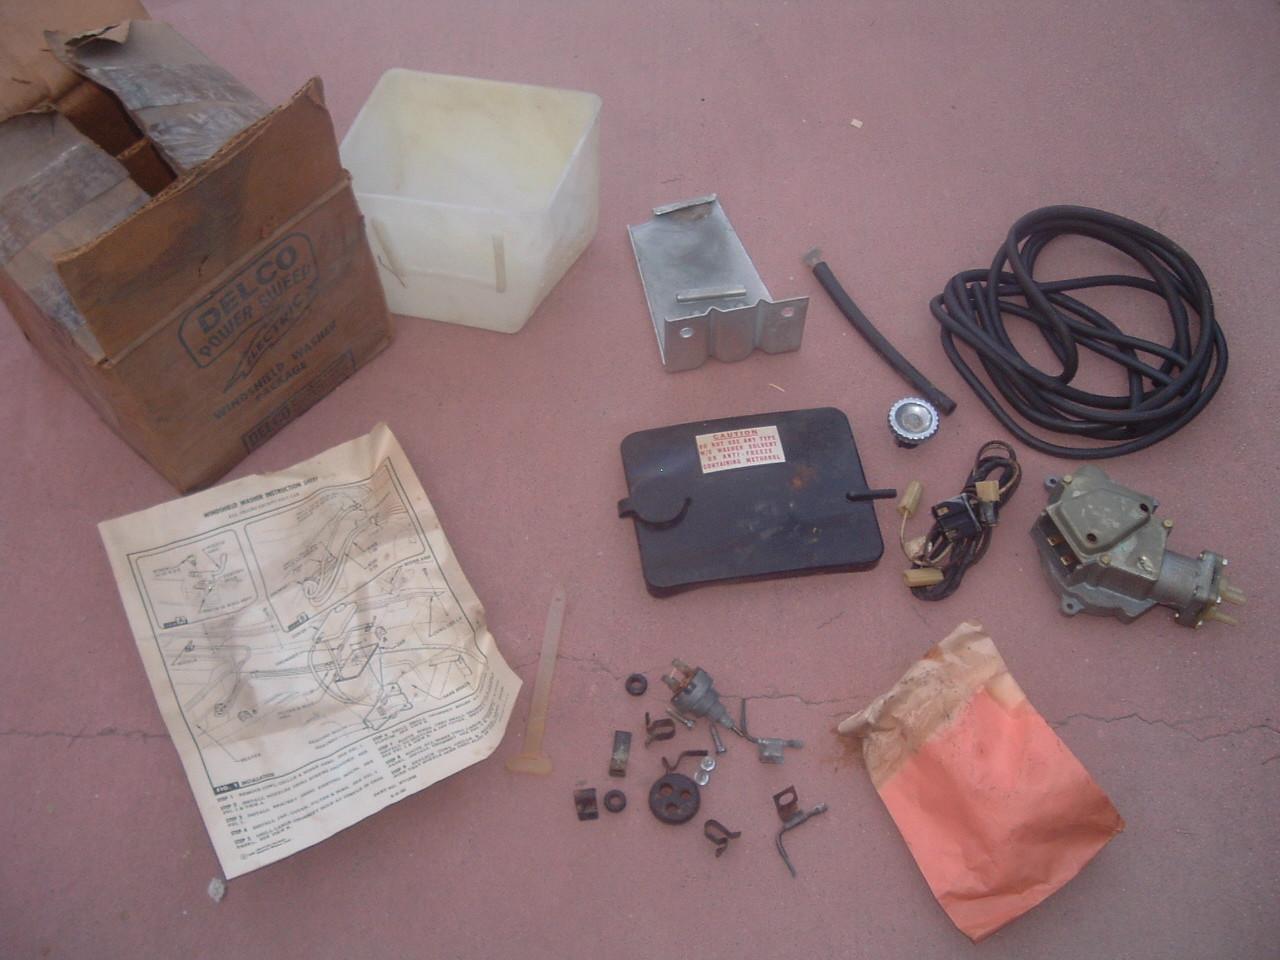 1960 61 chevrolet truck windshield washer kit nos gm # 988220 (z 988220)